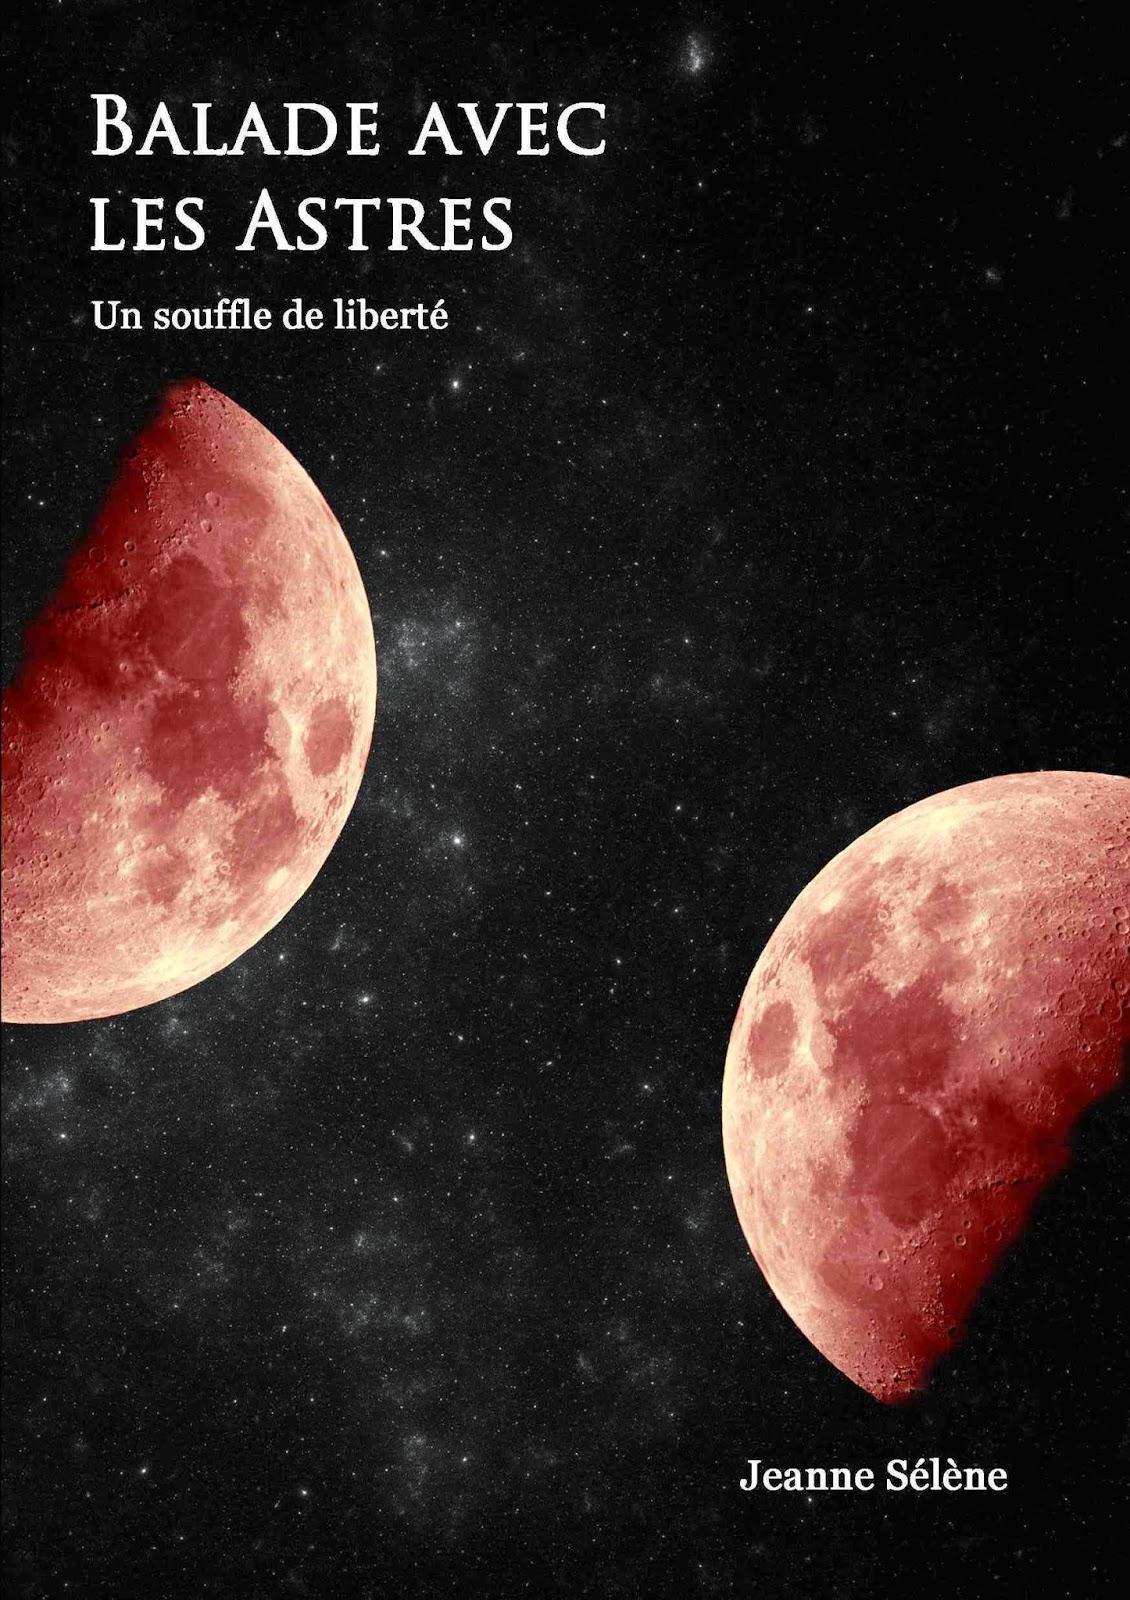 livre de fantasy balade avec les astres jeanne sélène